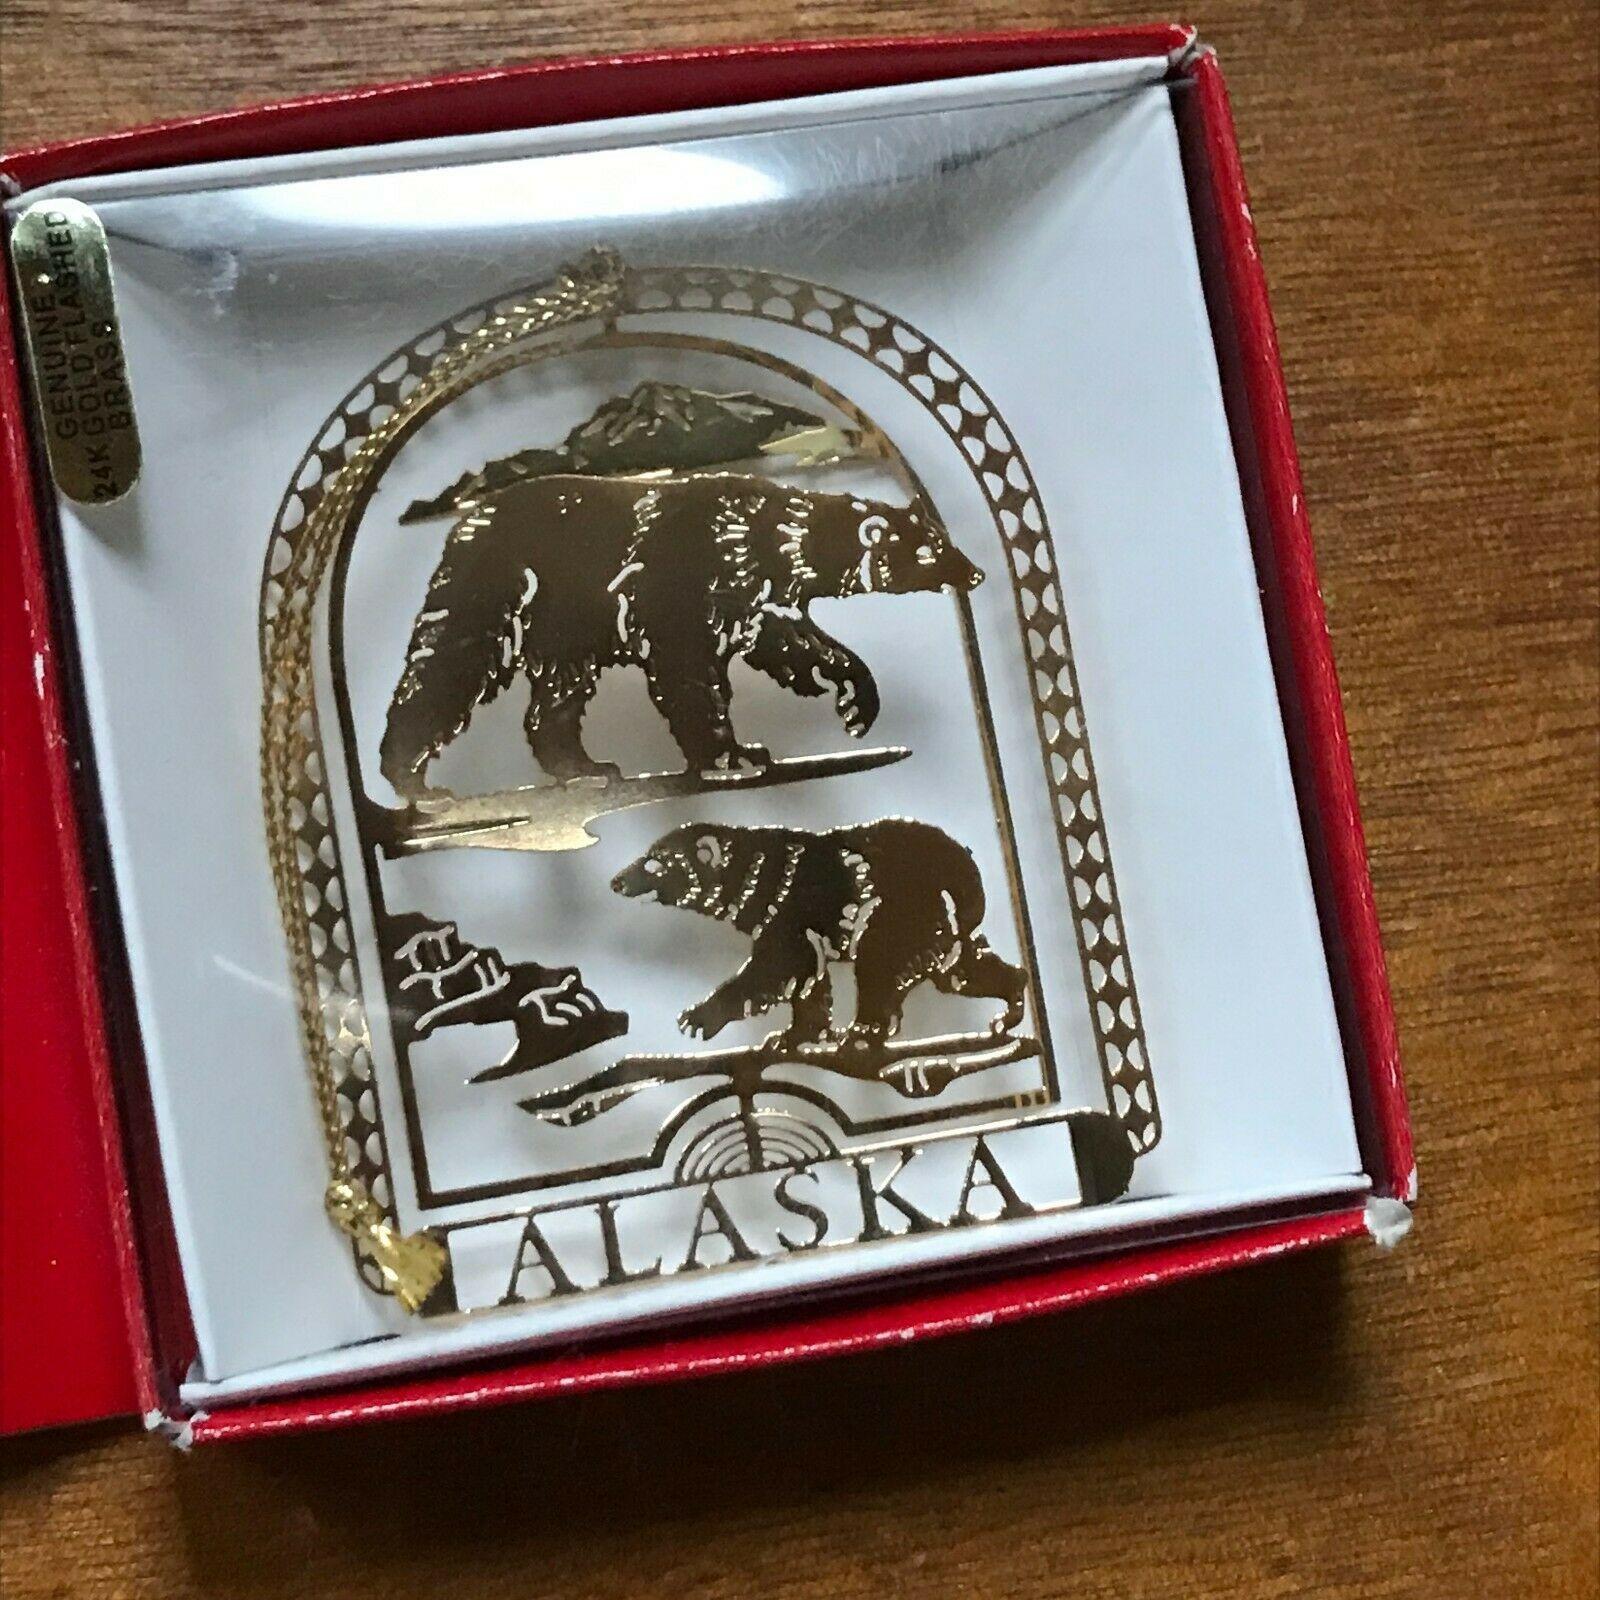 Estate 14K Gold Plated Alaska Bears Travel Souvenir Christmas Tree Ornament – 2.